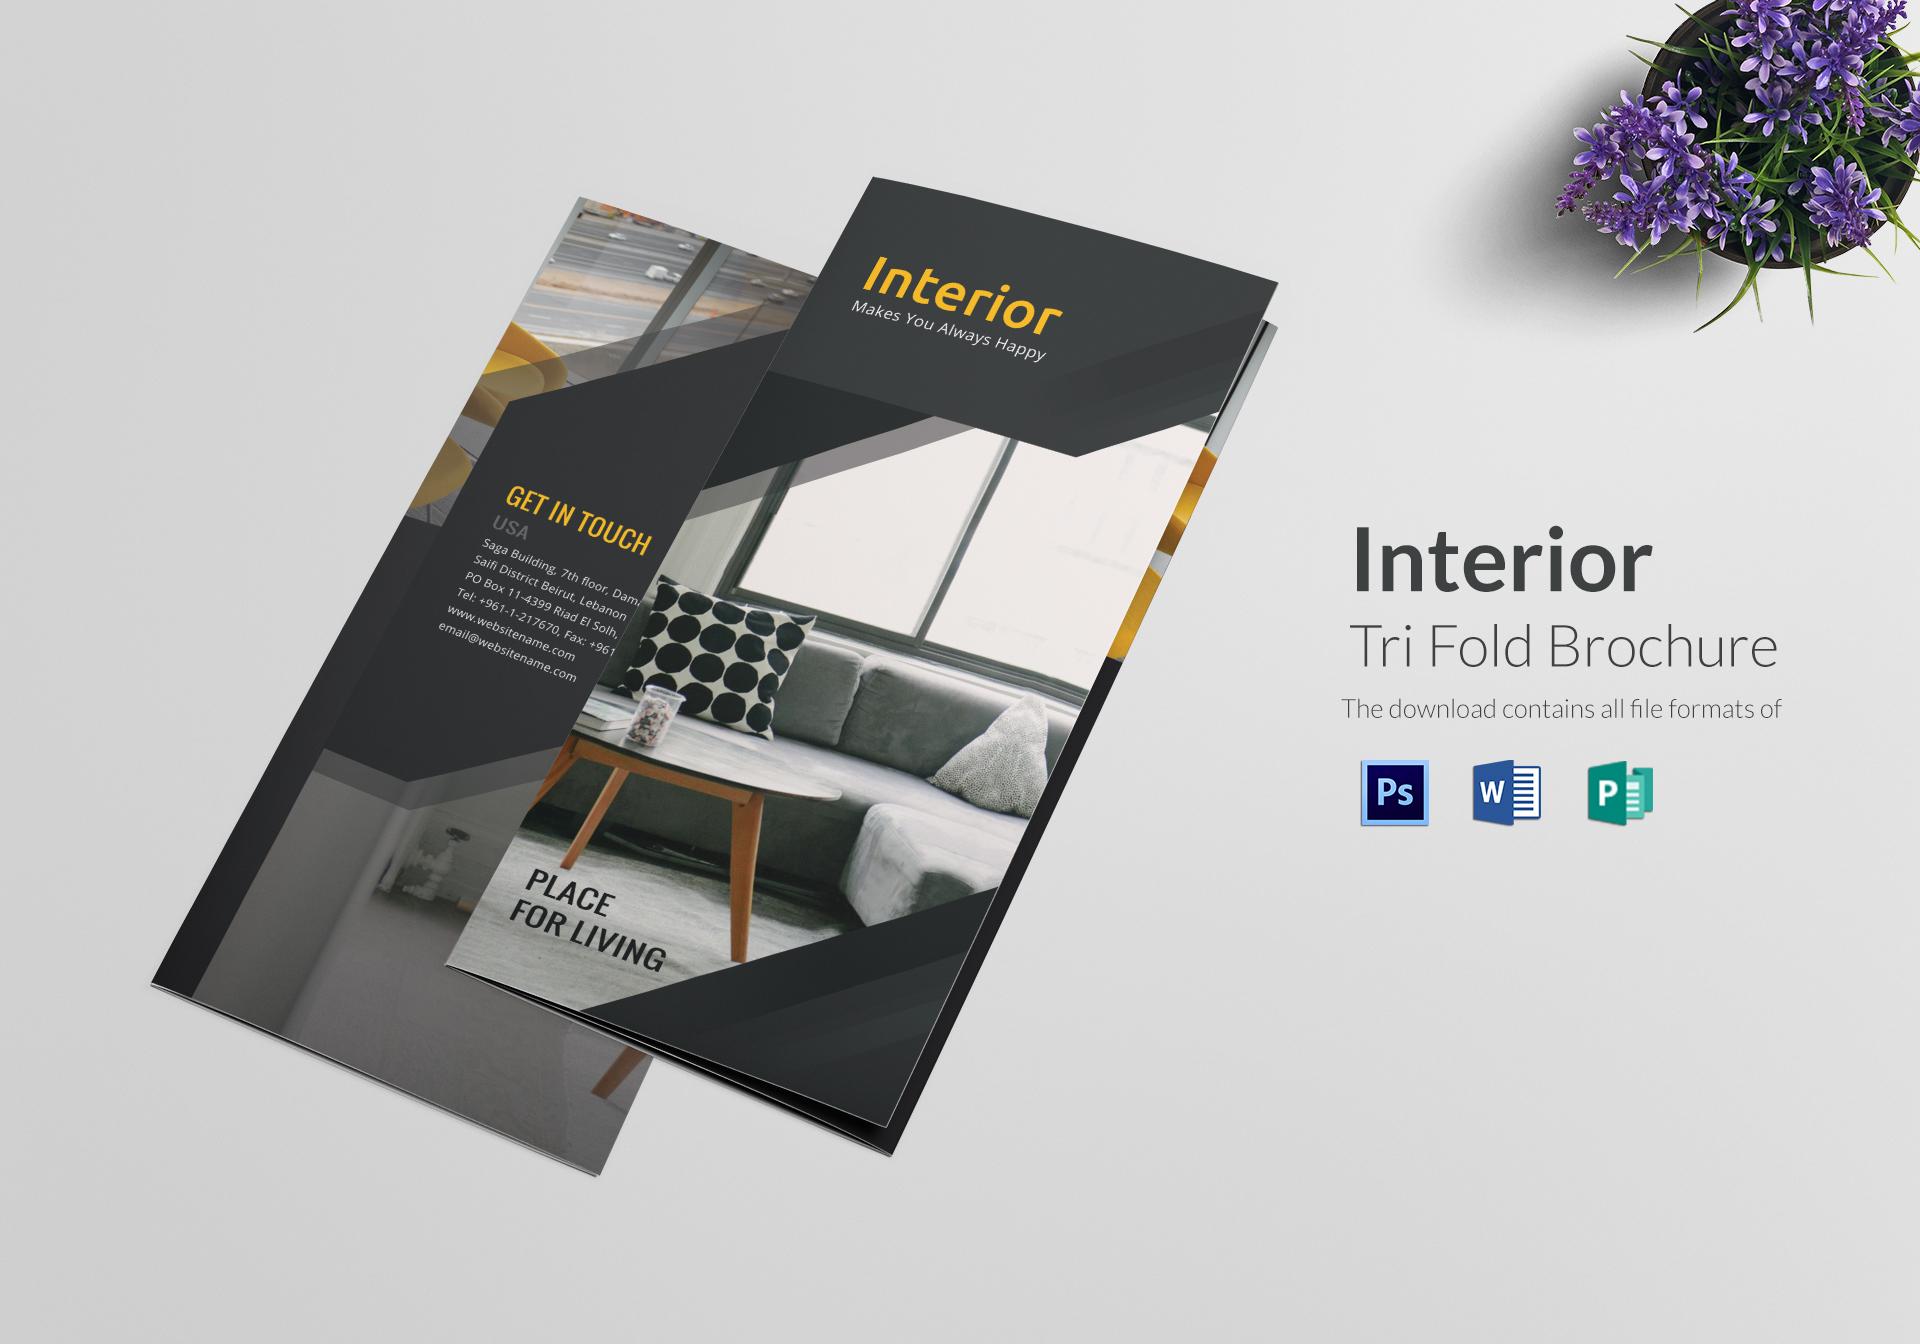 dark themed interior trifold brochure